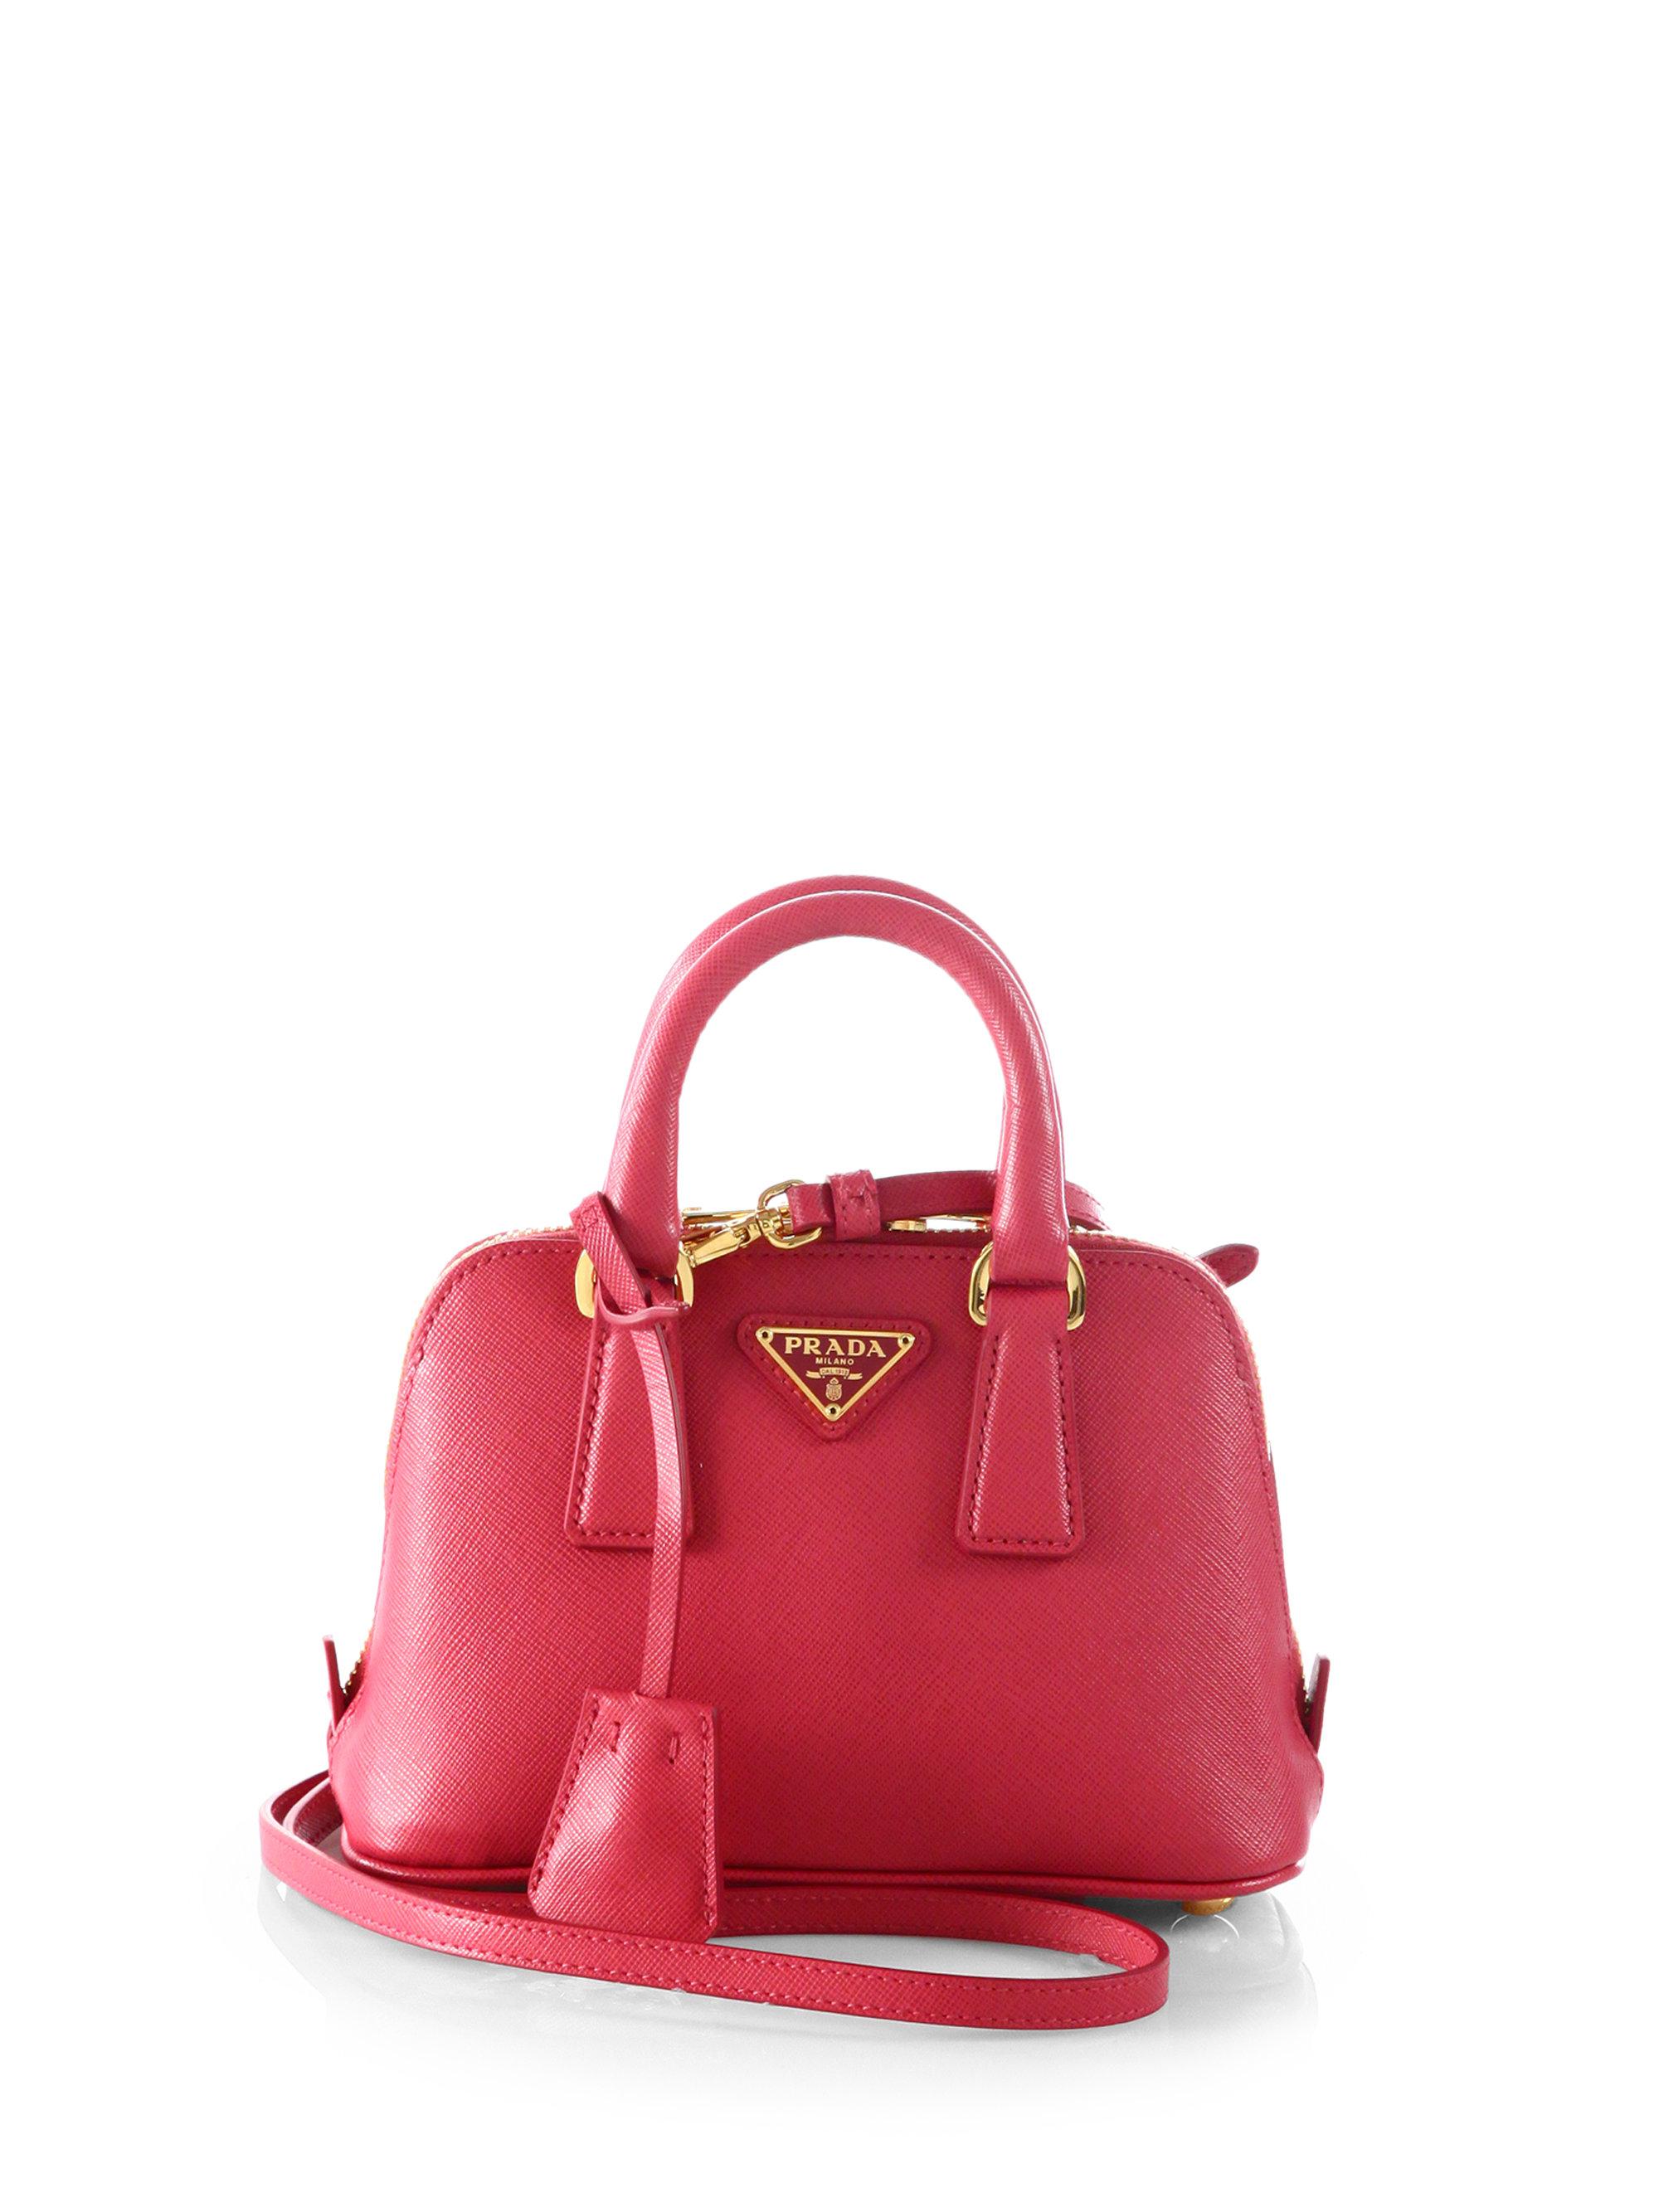 c185fcd335e7fc ... new zealand lyst prada saffiano lux double handle mini satchel in pink  aa338 8f188